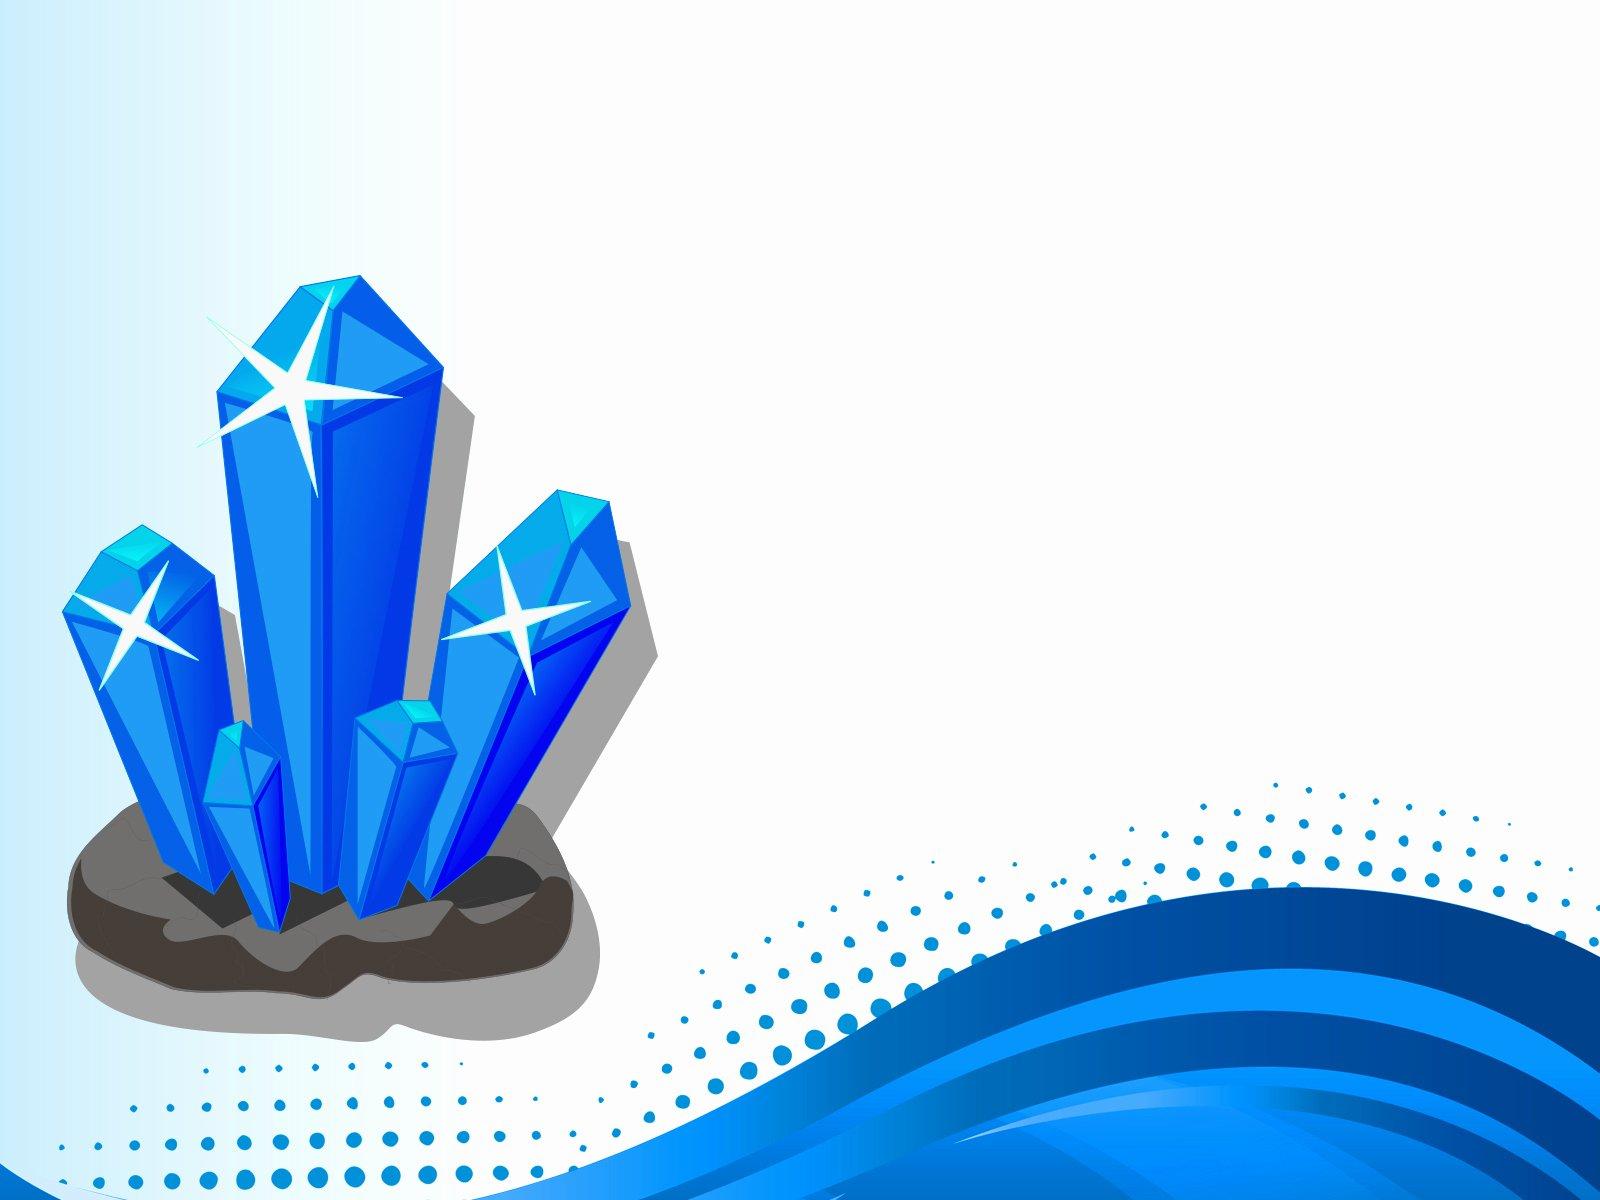 3d Crystal Backgrounds 3d Blue Templates